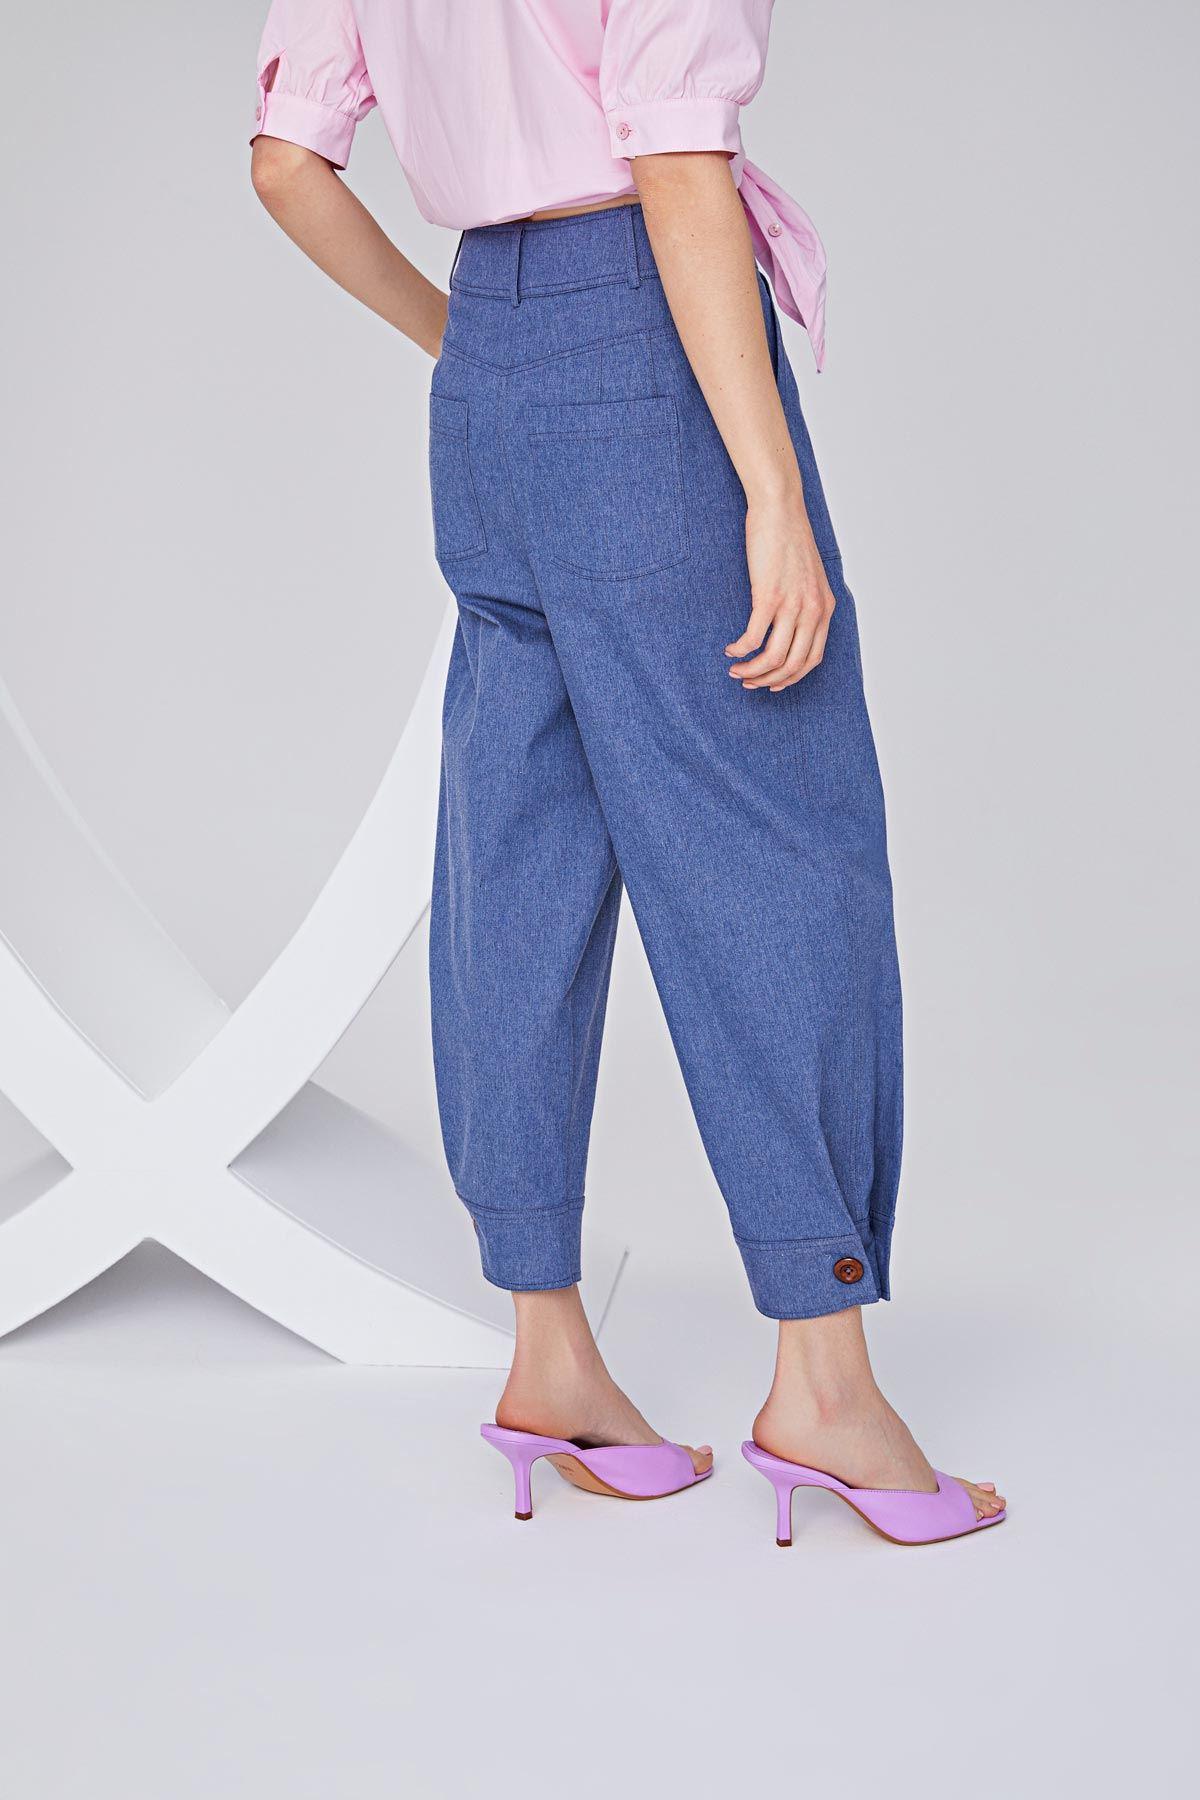 Pilili culotte pantolon Mavi